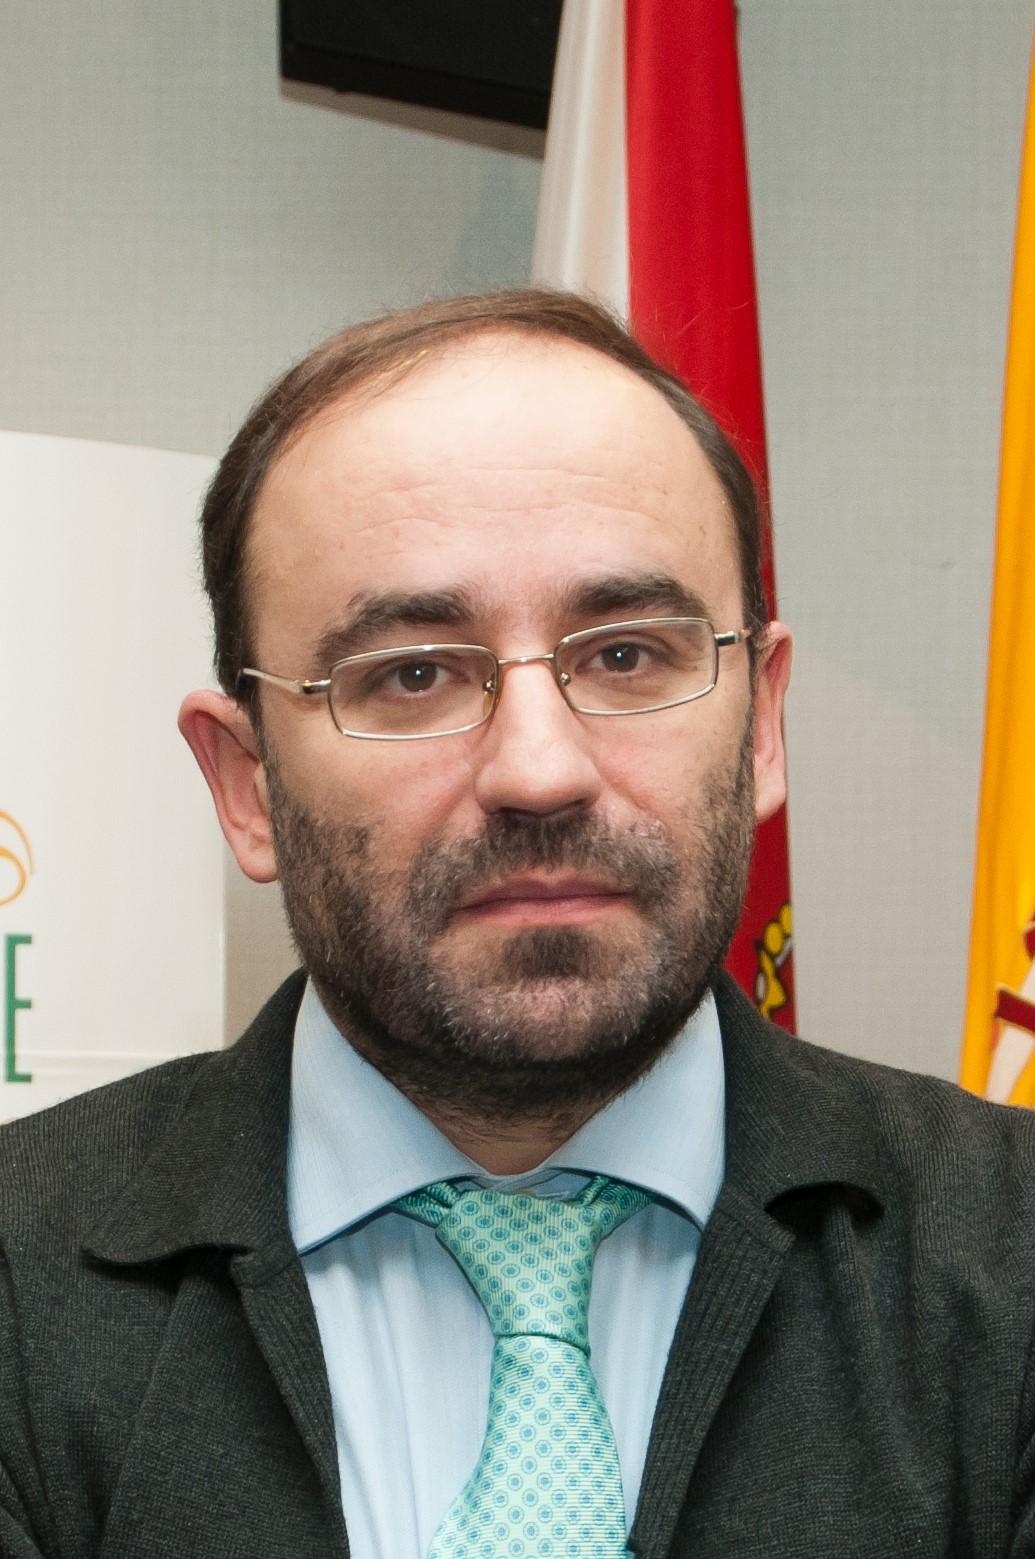 Abel Veiga